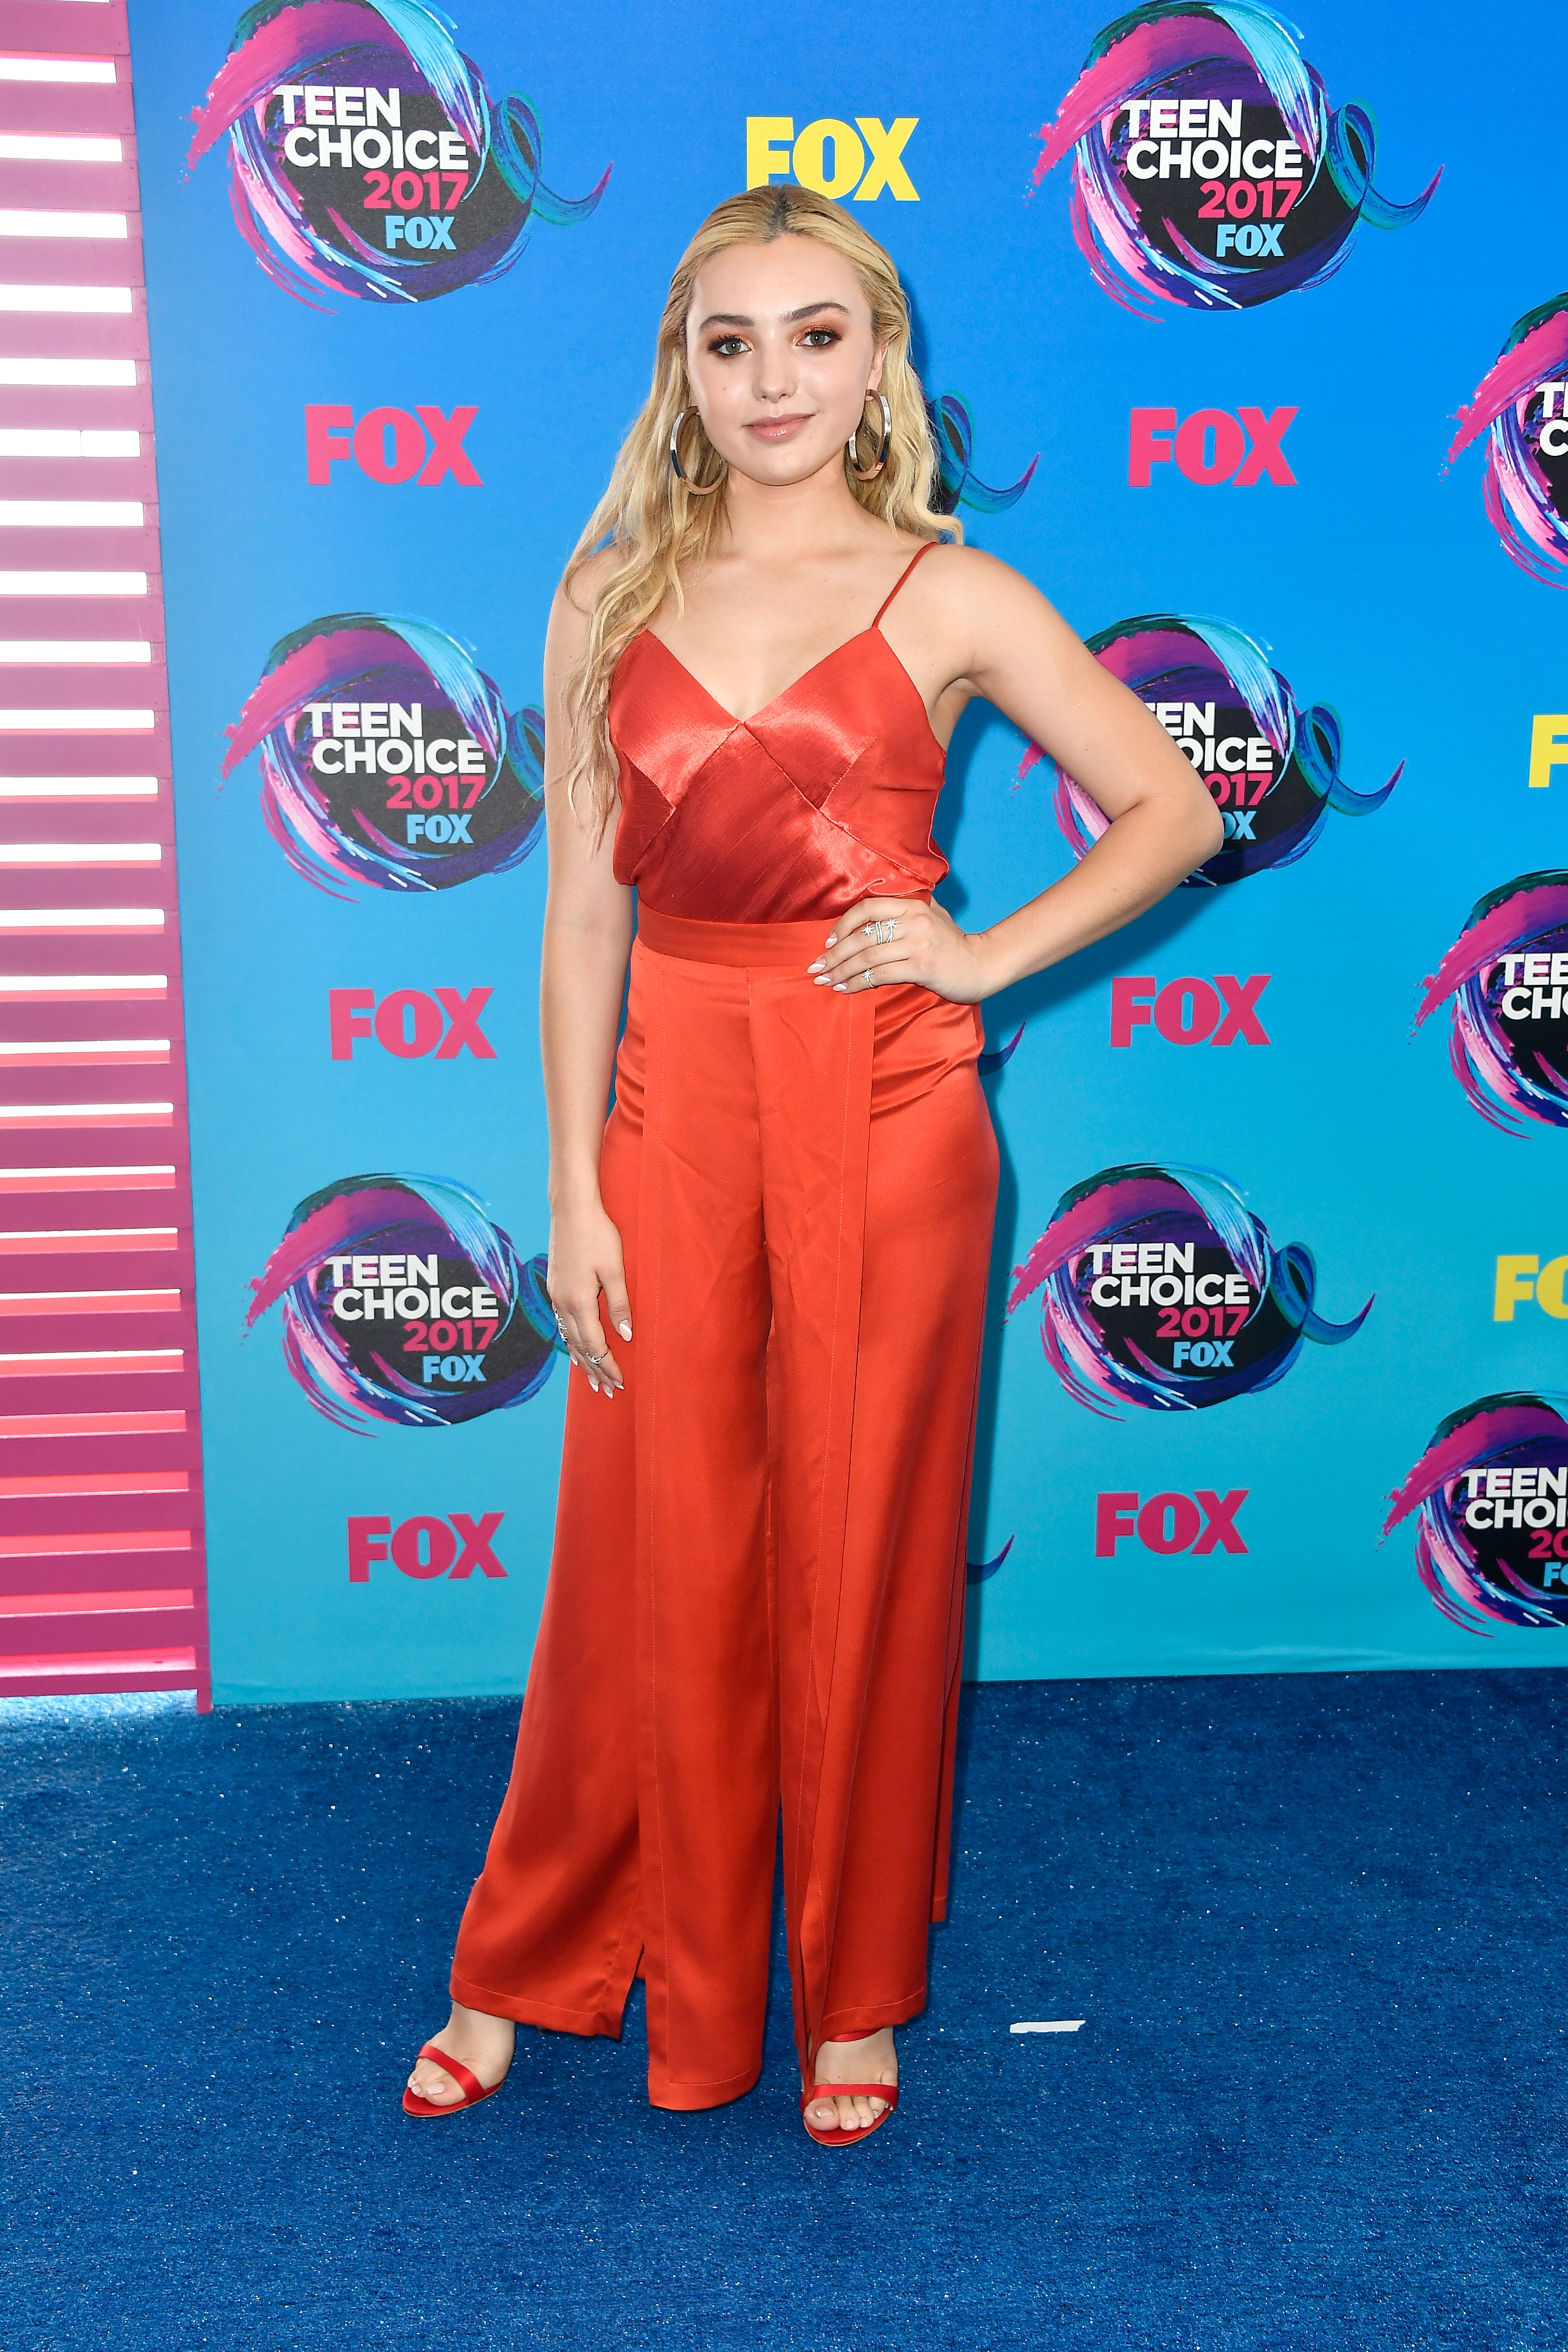 Teen Choice Awards 2017 -Peyton List